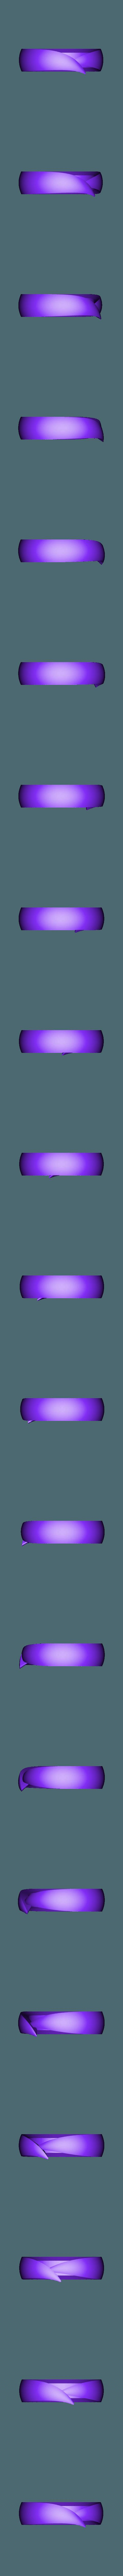 stl 18.4.stl Download STL file WEDDING RING - 001 • Model to 3D print, tulukdesign